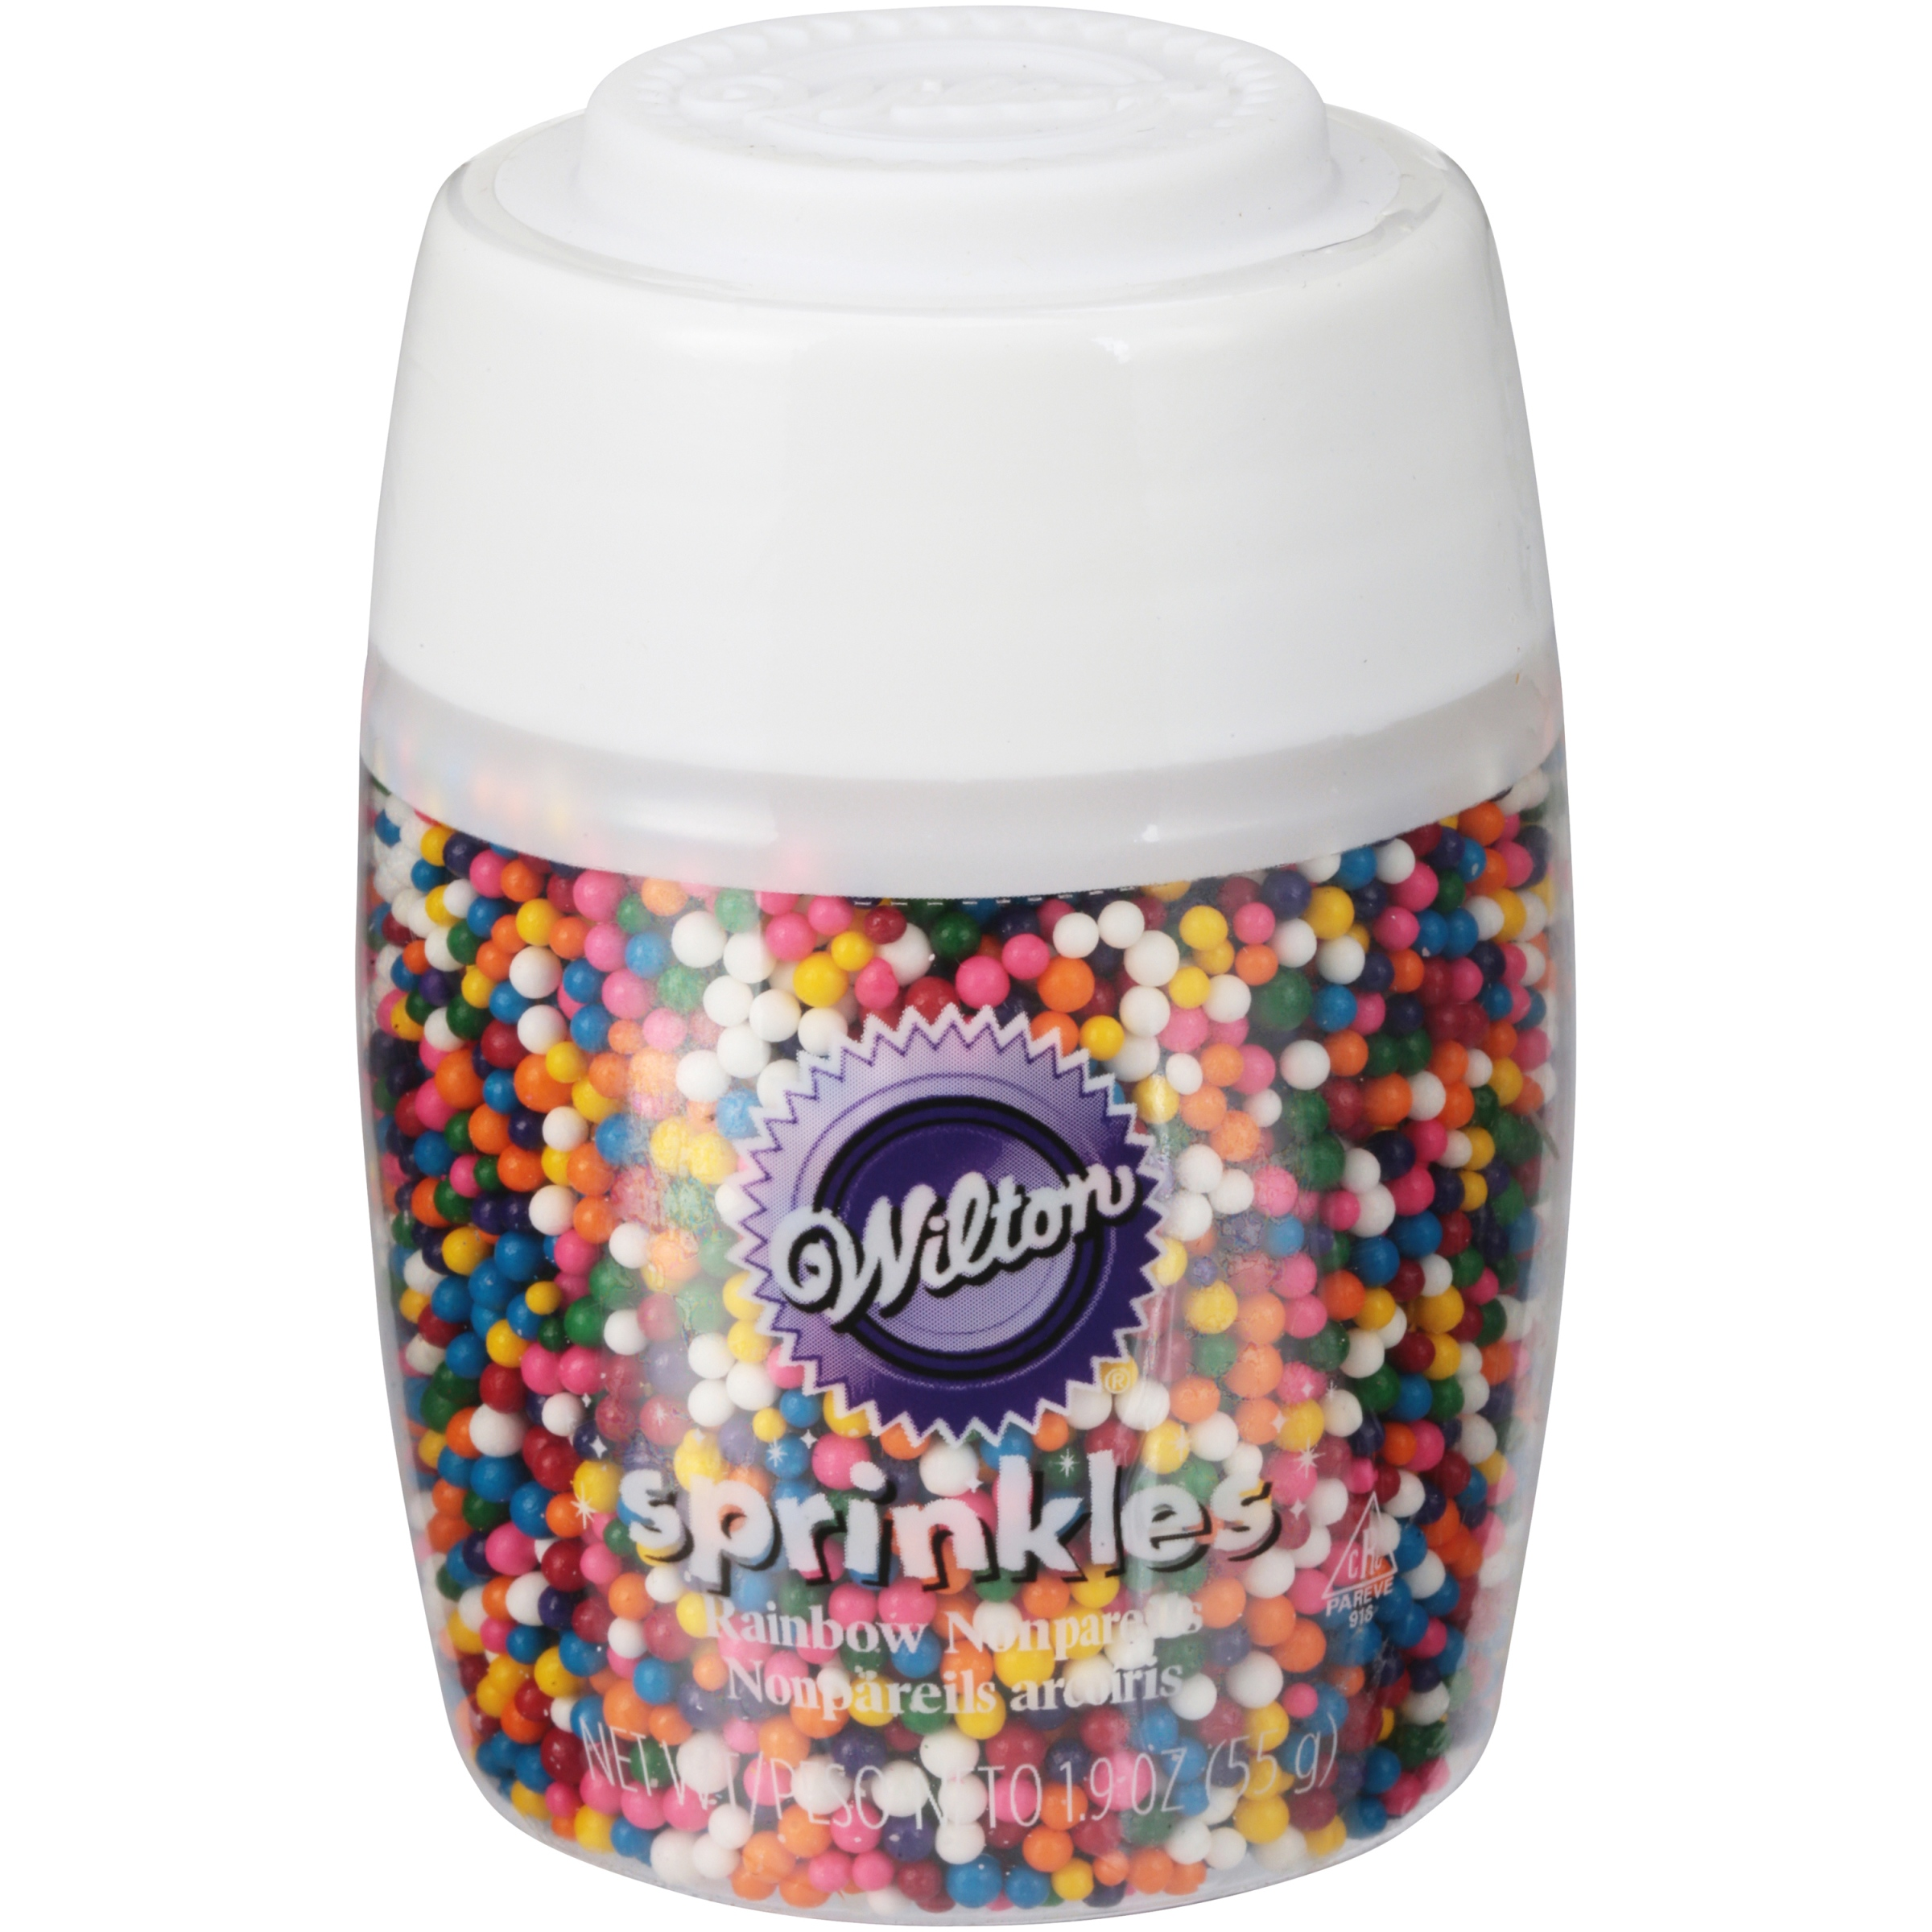 (4 Pack) Wilton Short Stack Rainbow Nonpareils Sprinkles